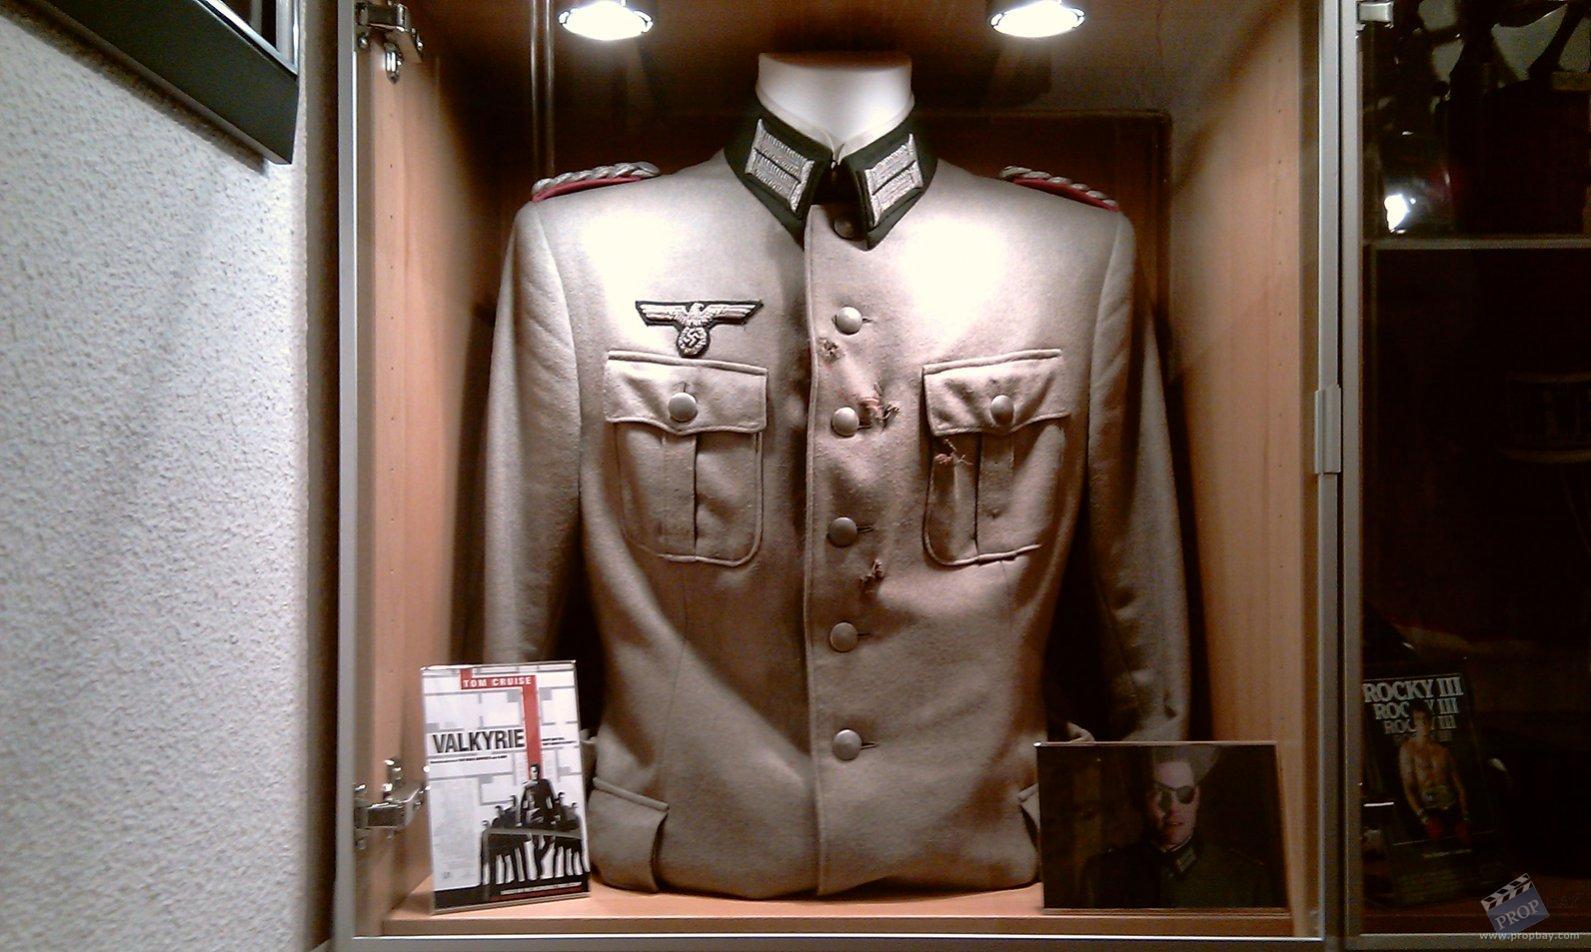 Colonel Claus Von Stauffenberg Tom Cruise Firing Squad Uniform Wardrobe From Valkyrie 2008 Online Movie Memorabilia Archive And Marketplace Propbay Com